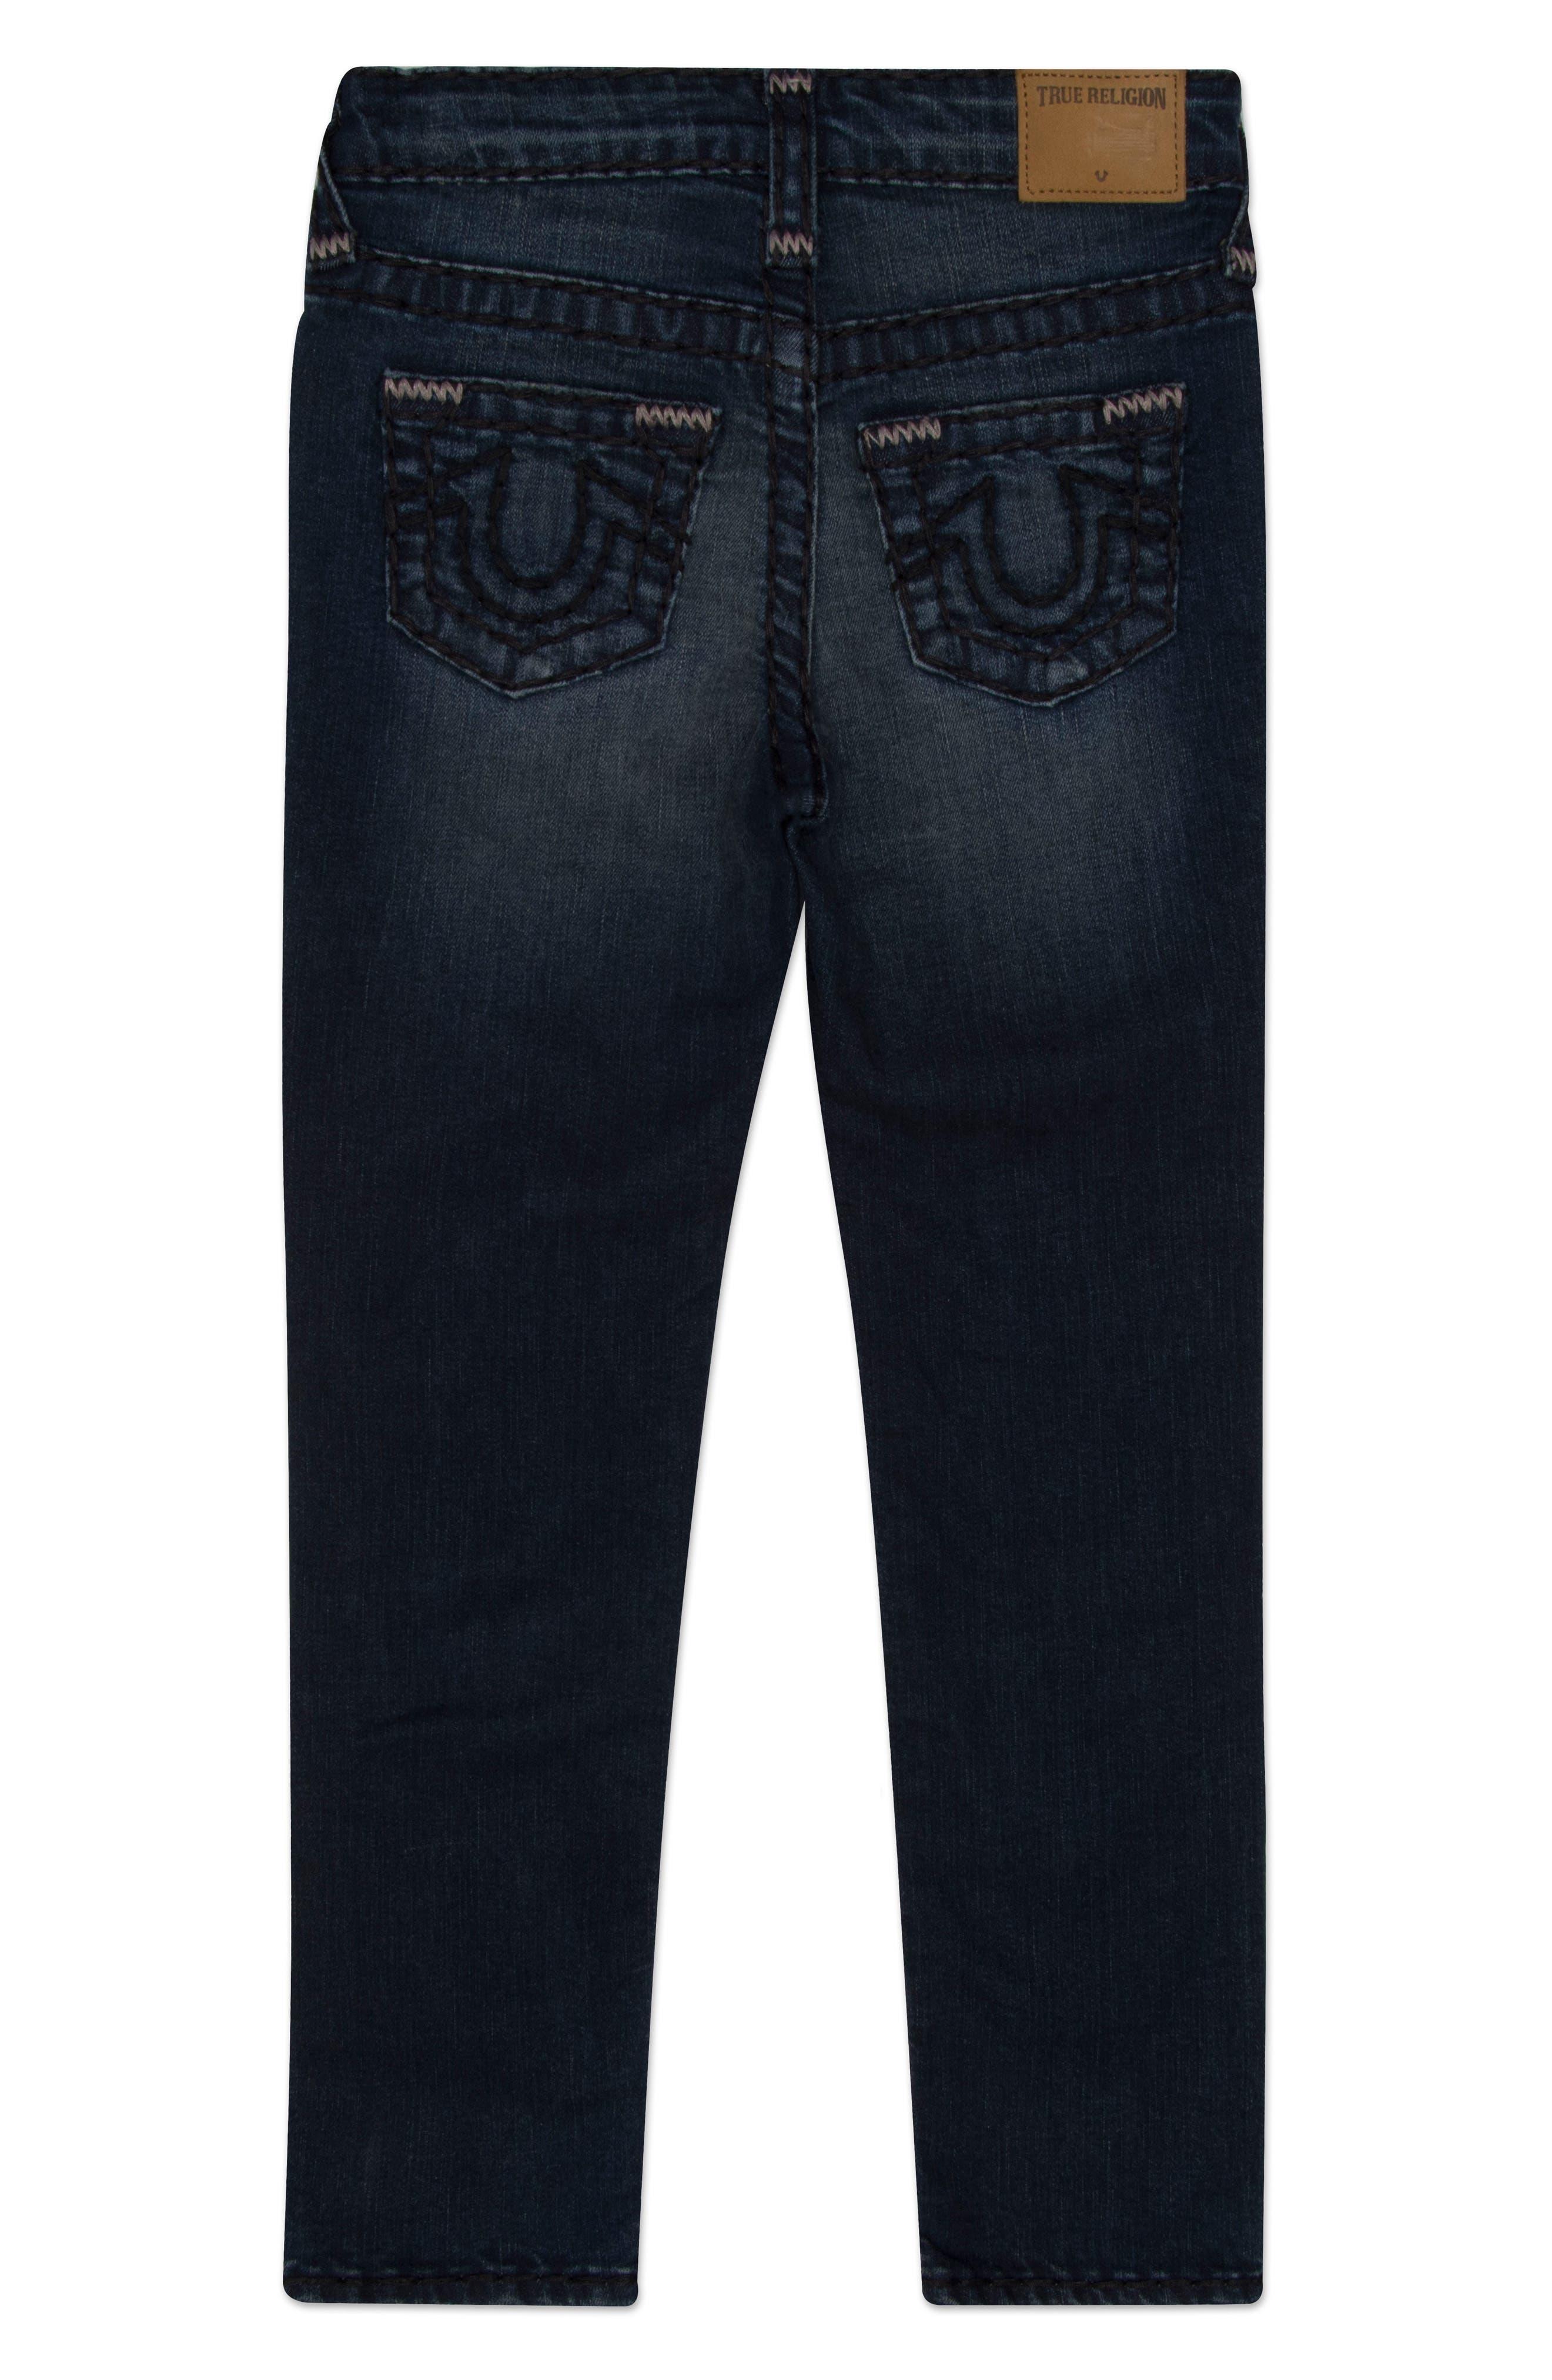 Geno Super T Jeans,                             Alternate thumbnail 2, color,                             022